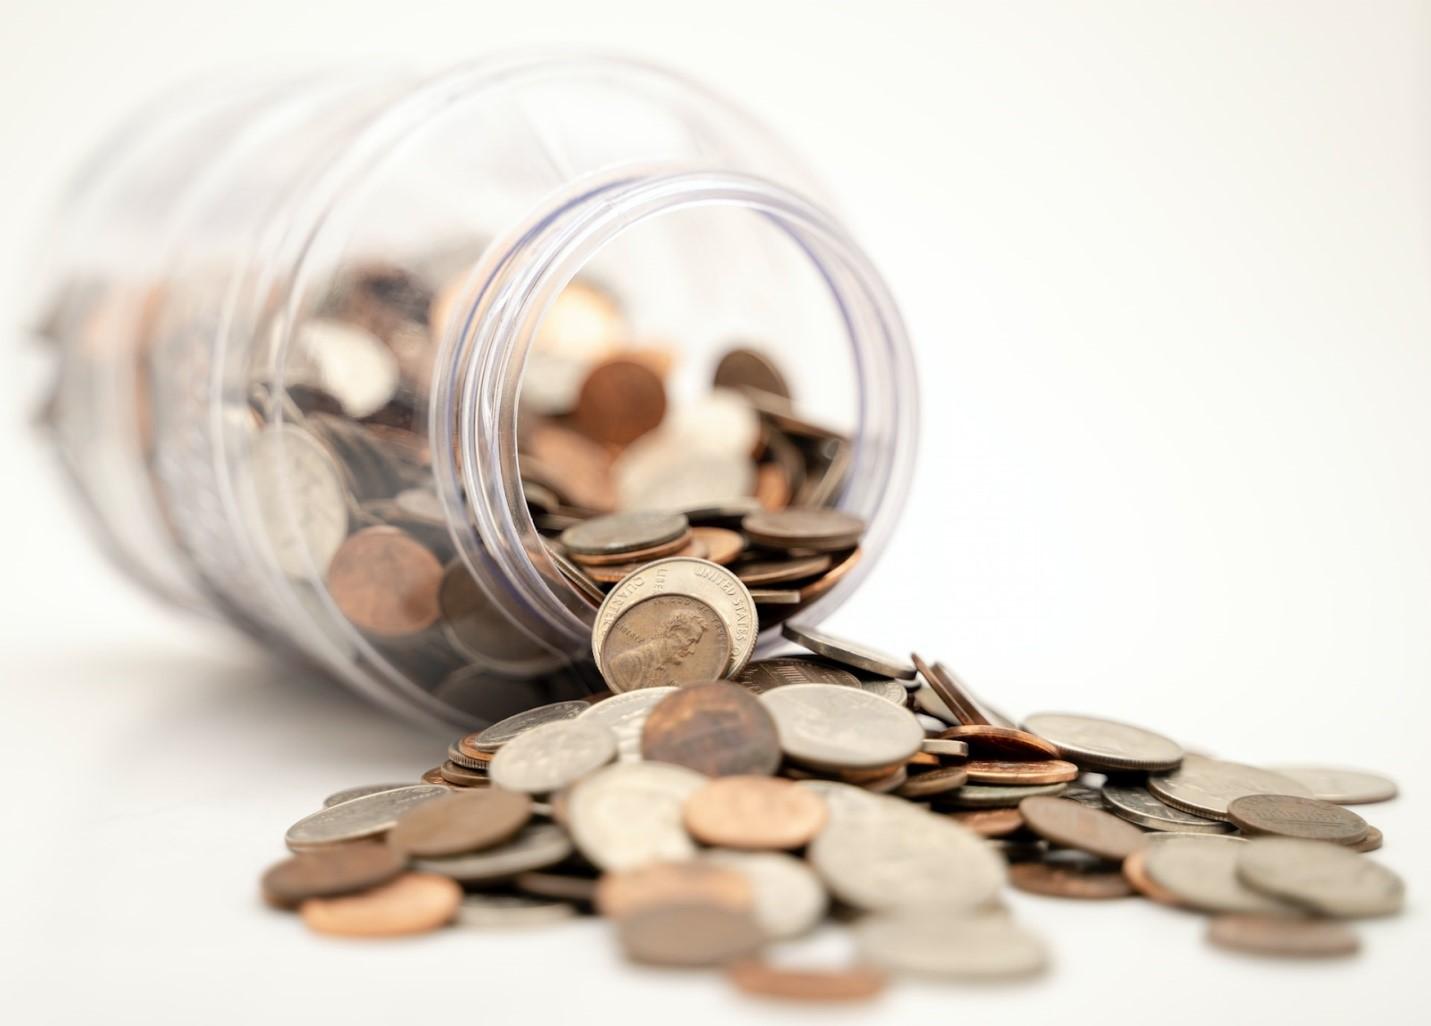 Income statement reveals profit details with ZarMoney